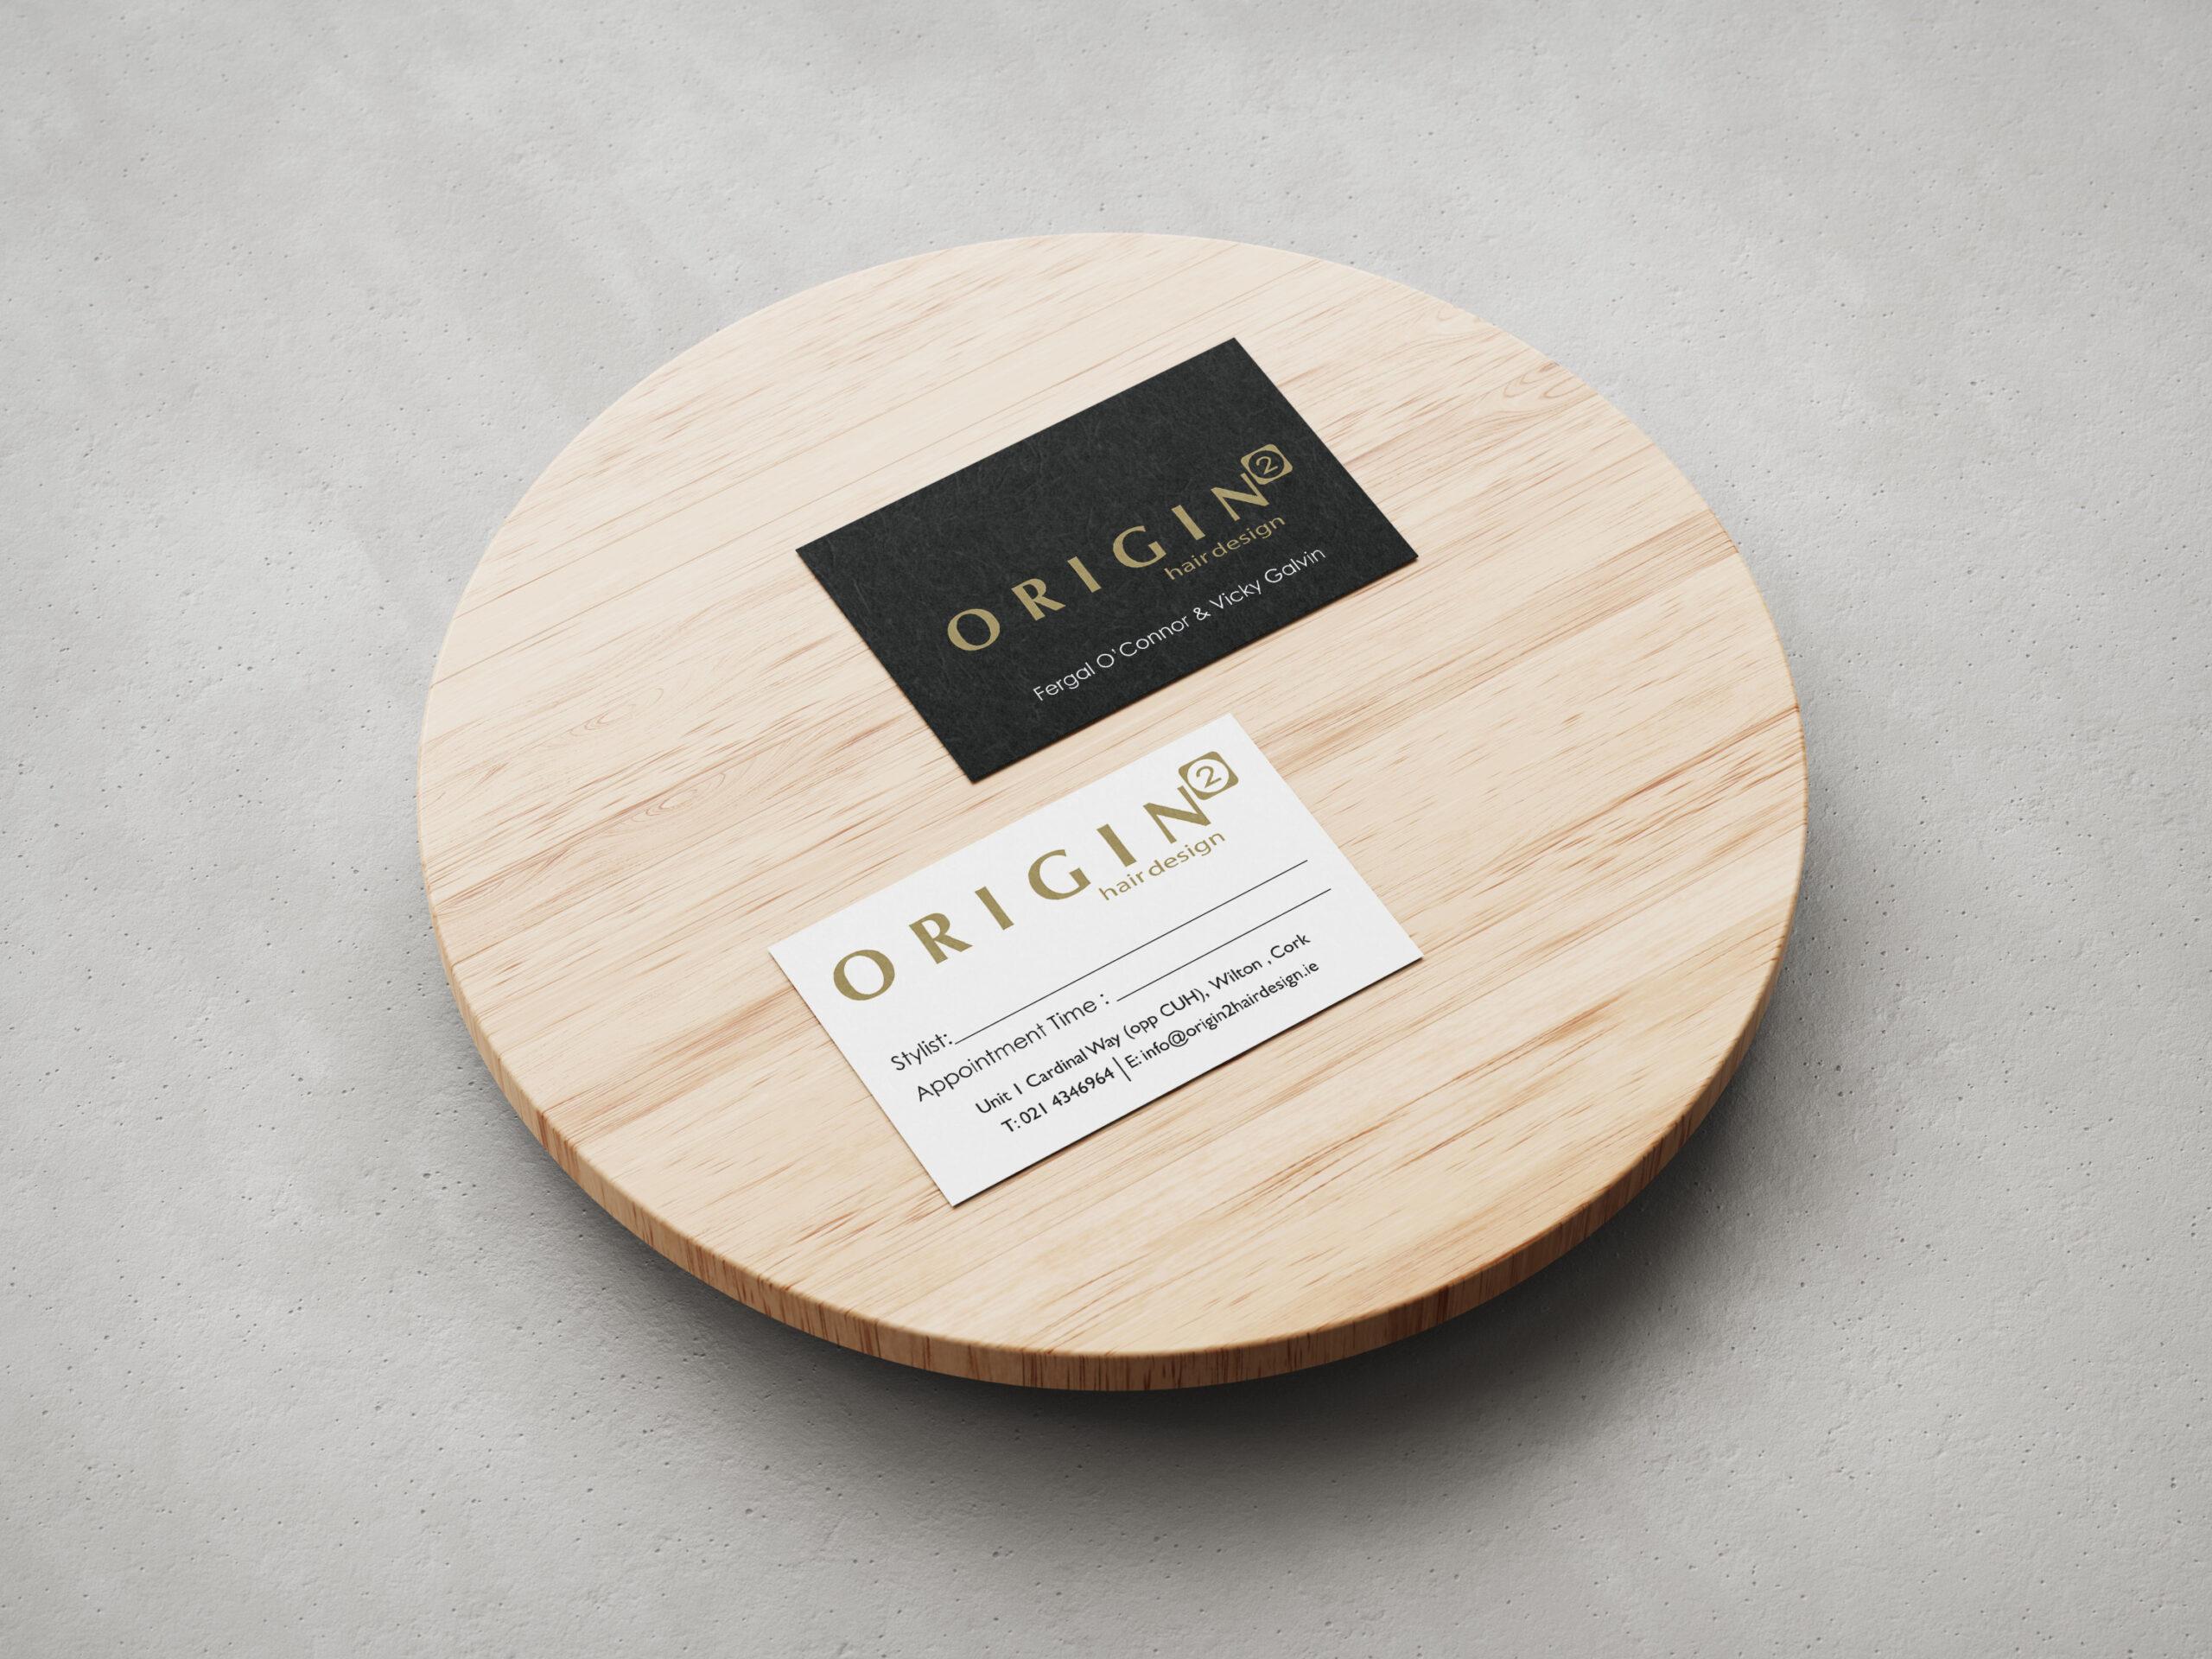 Origin Business Cards on Plate